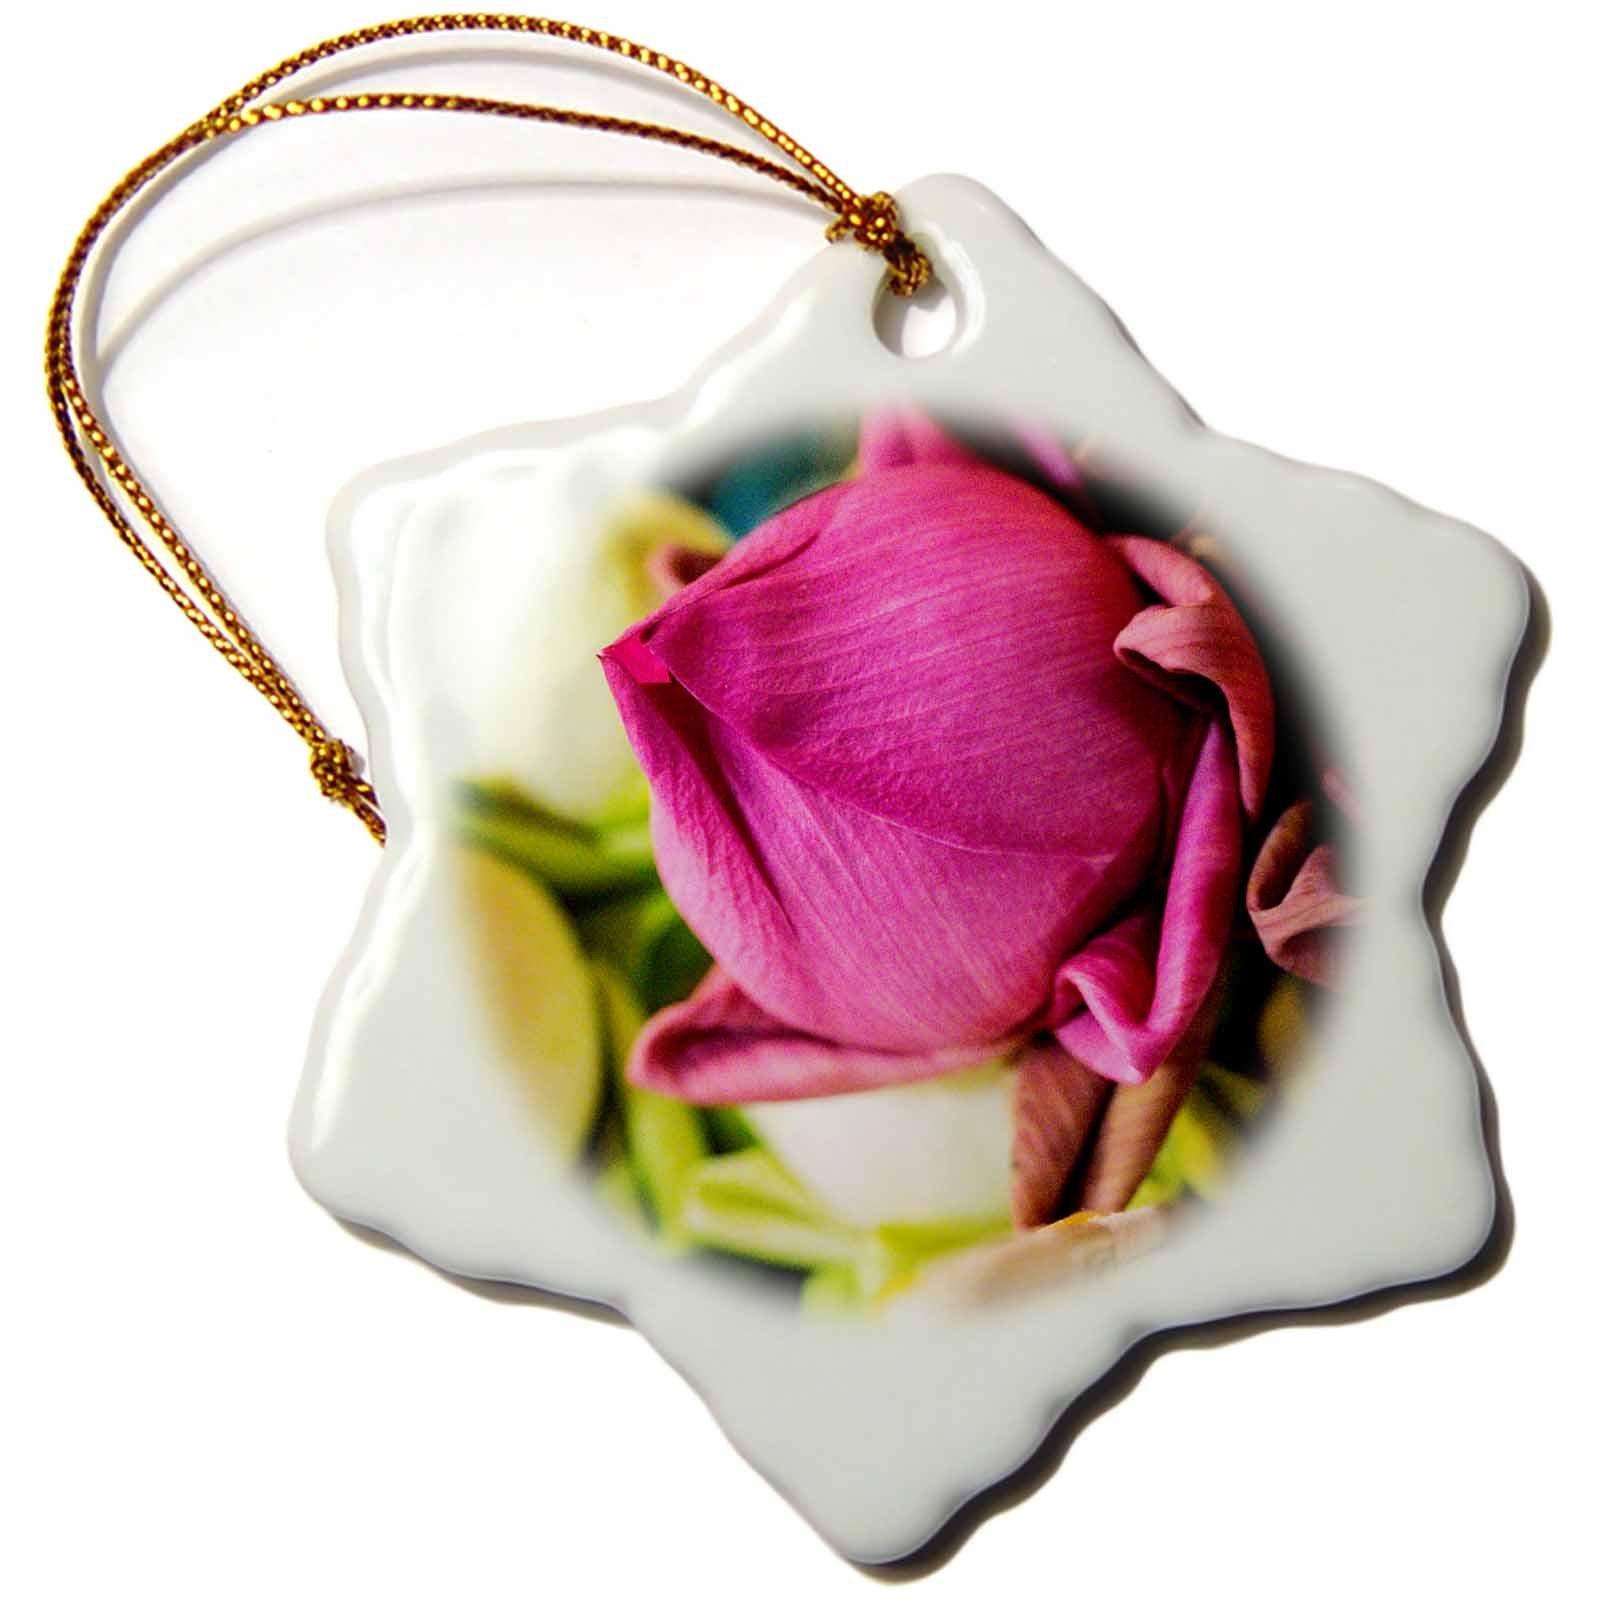 3dRose Danita Delimont - Flowers - Thailand, Chiang Mai, Flowers at the Thai Market Place - 3 inch Snowflake Porcelain Ornament (orn_276974_1)